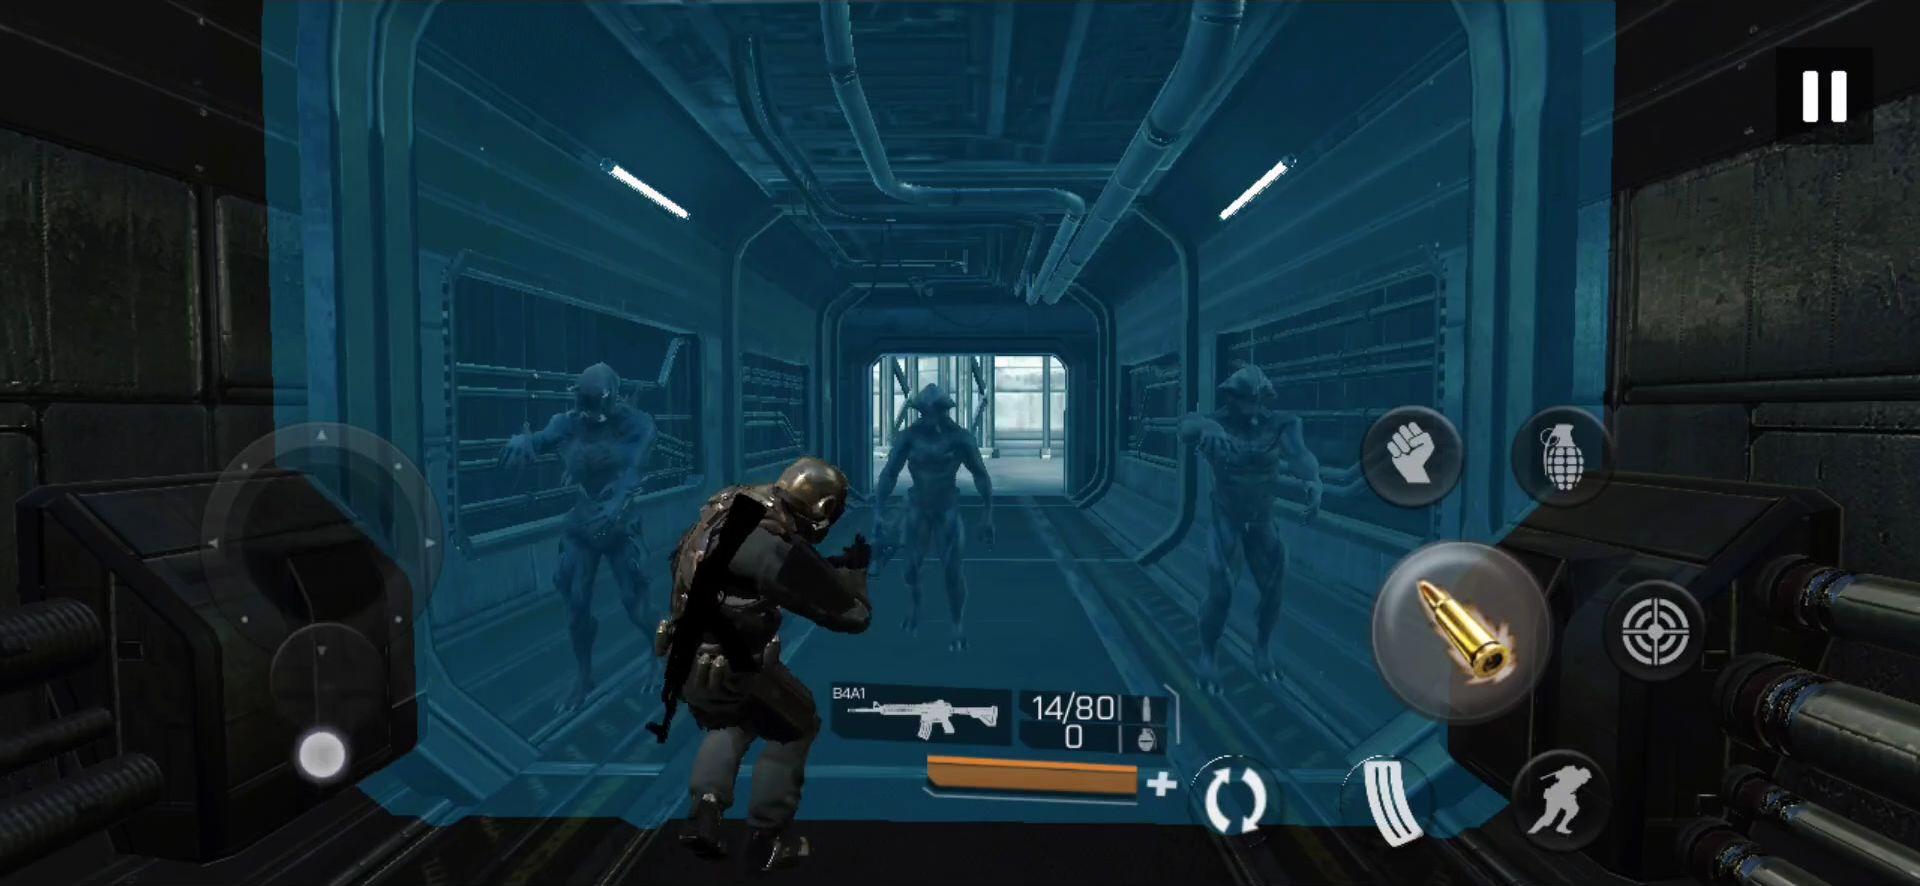 Juegos de disparos Dead Zone - Action TPS para teléfono inteligente